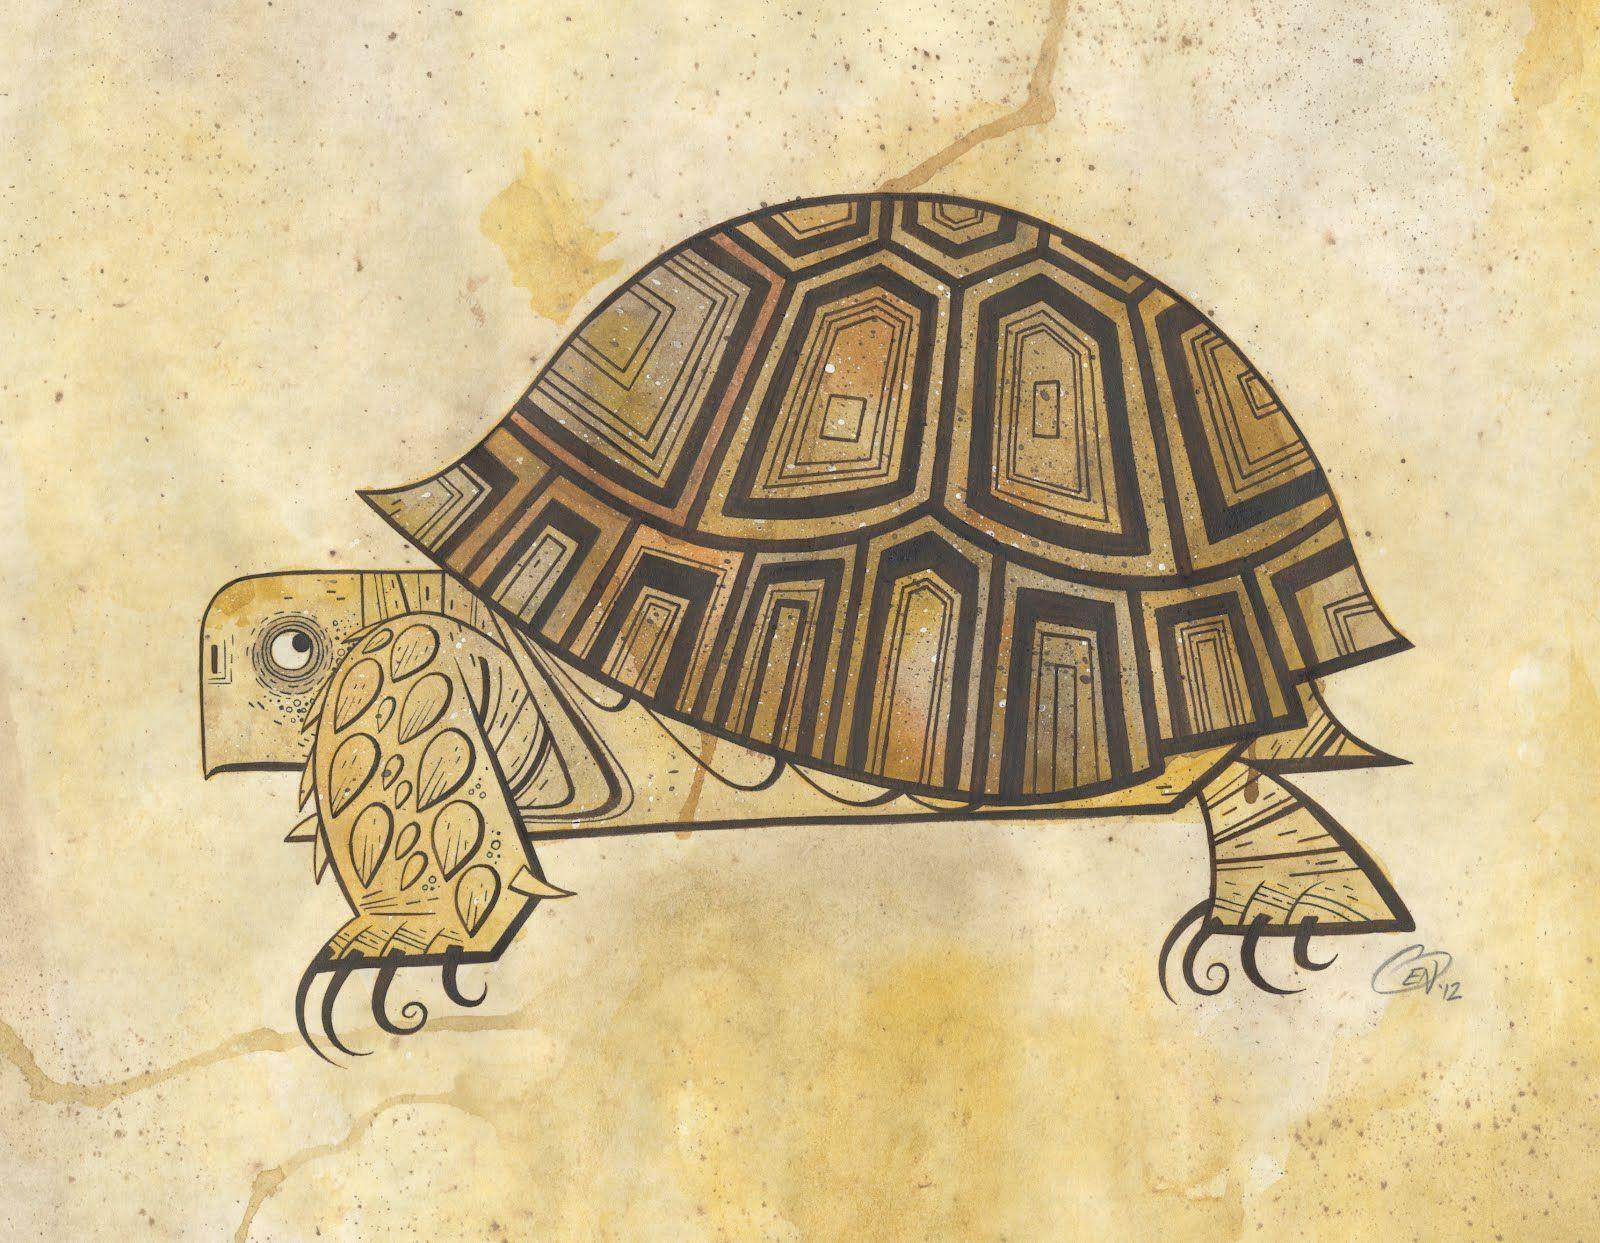 tortoise drawing for pinterest - photo #3